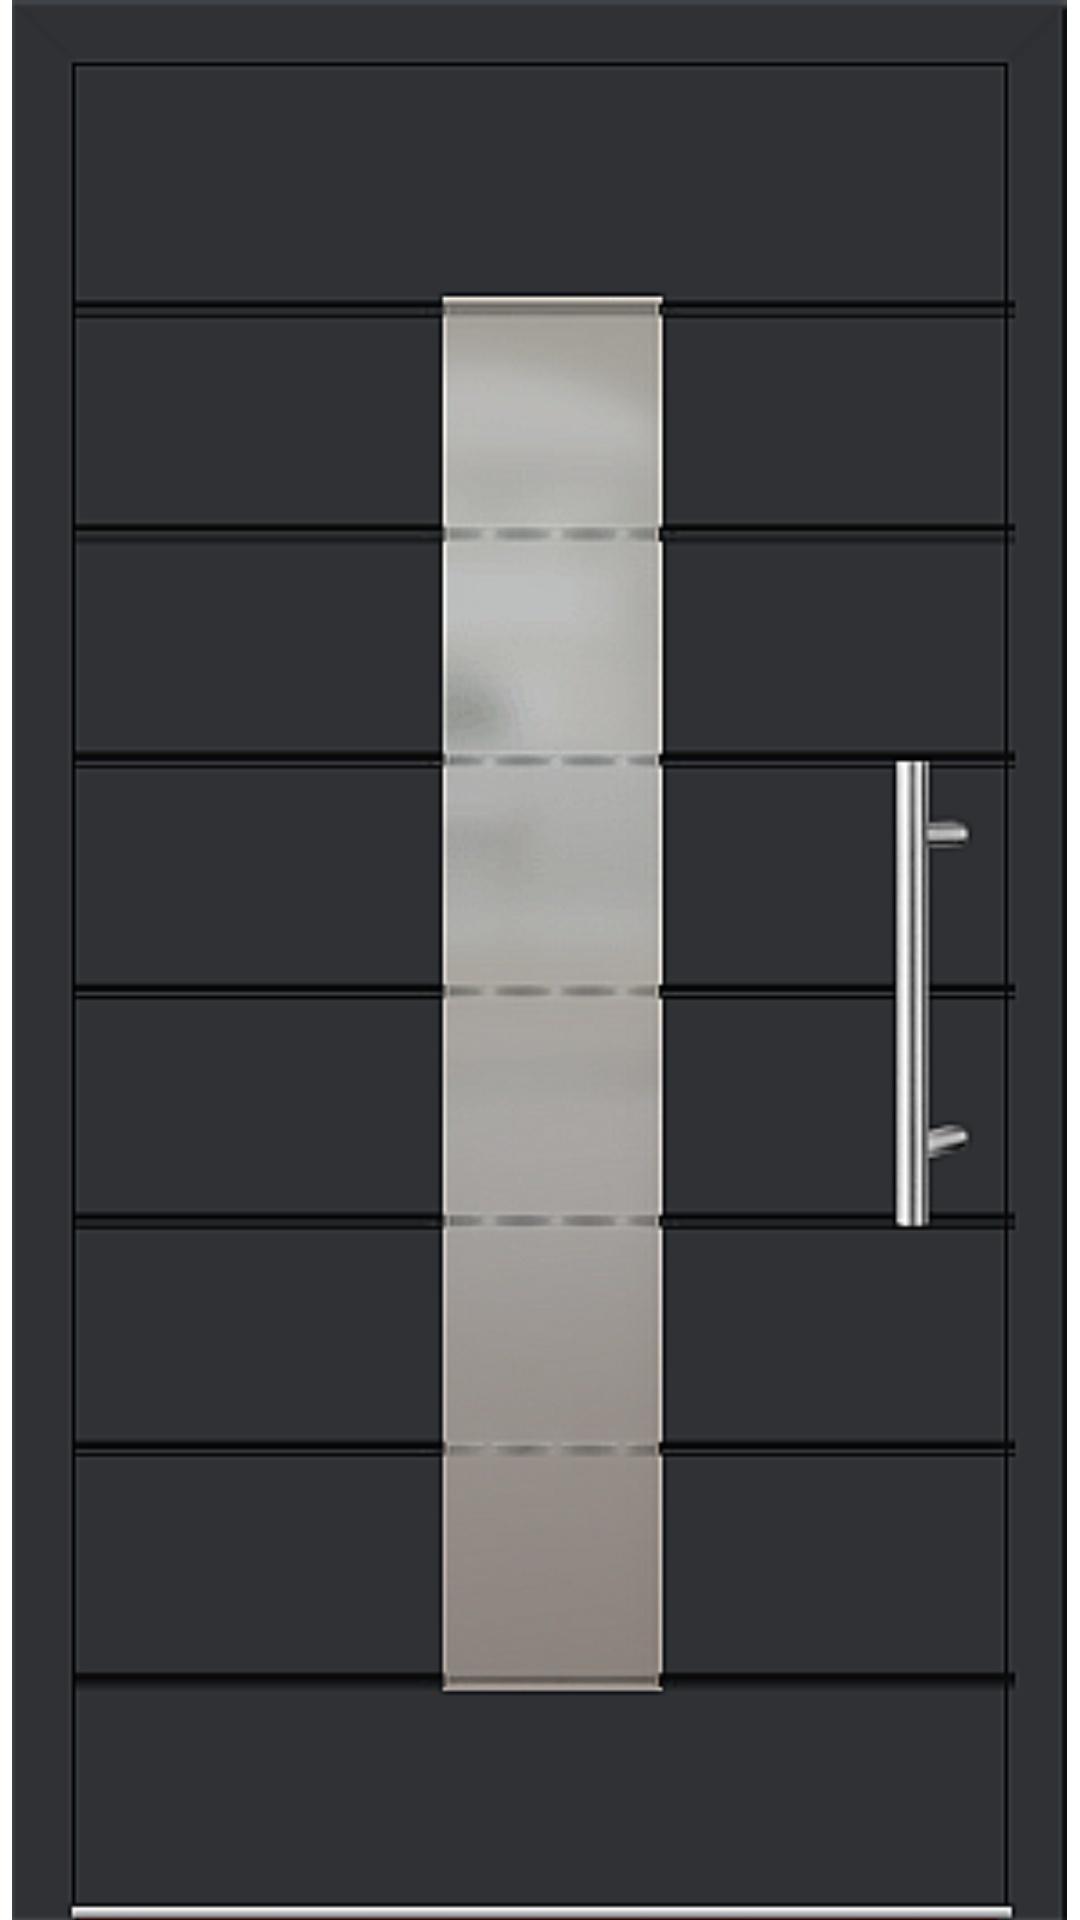 Aluminium Haustür Modell 6559-52 schwarz